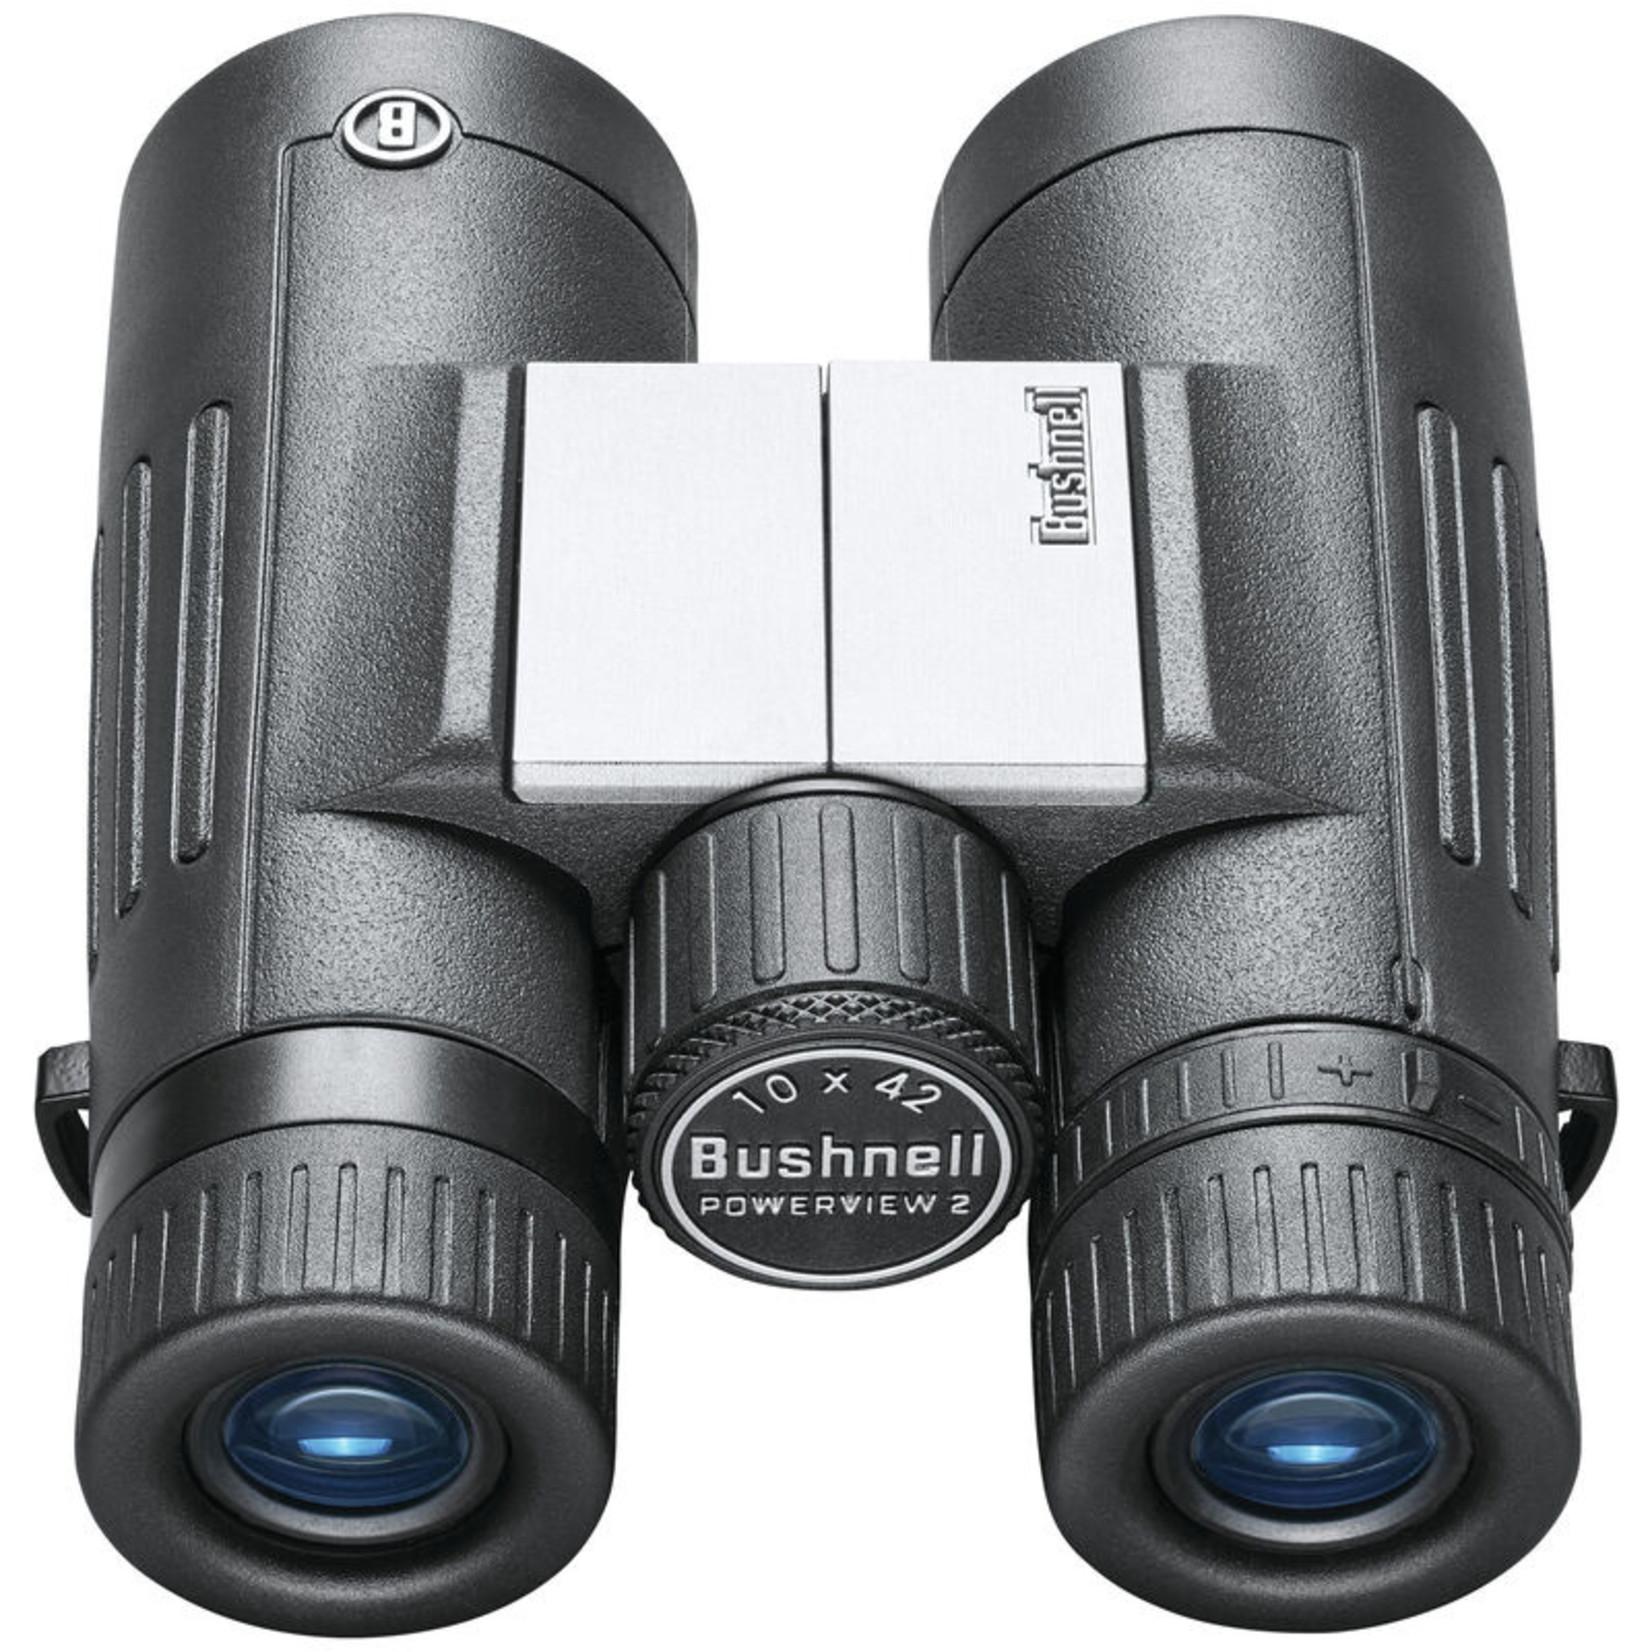 Bushnell 10x42 2.0 Aluminum MC, Metal Chass, Rubber Armor Binoculars